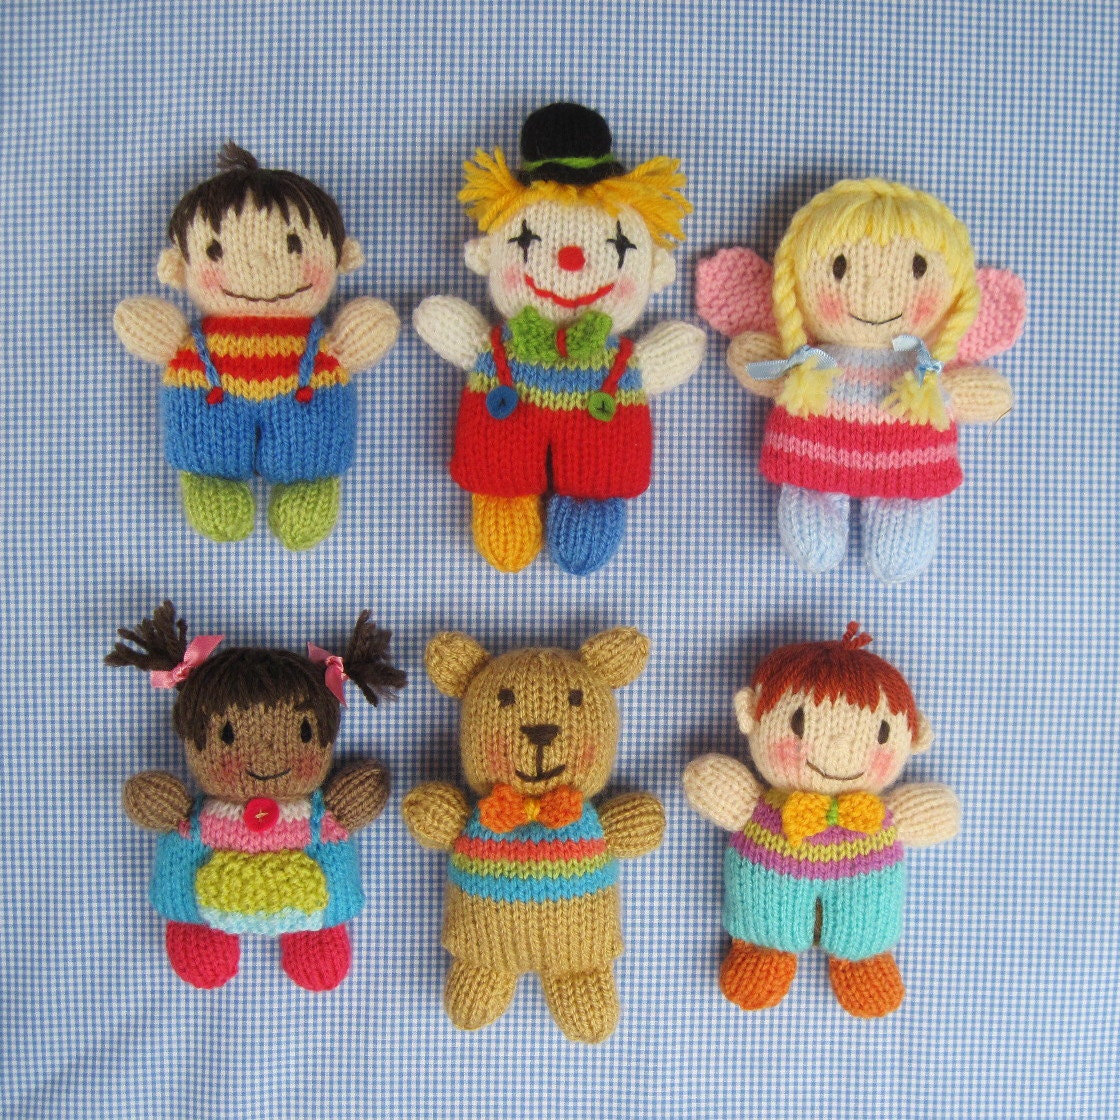 Knitting Patterns Mini Toys : Toyshelf Tots knitted toy girls boys fairy clown by toyshelf